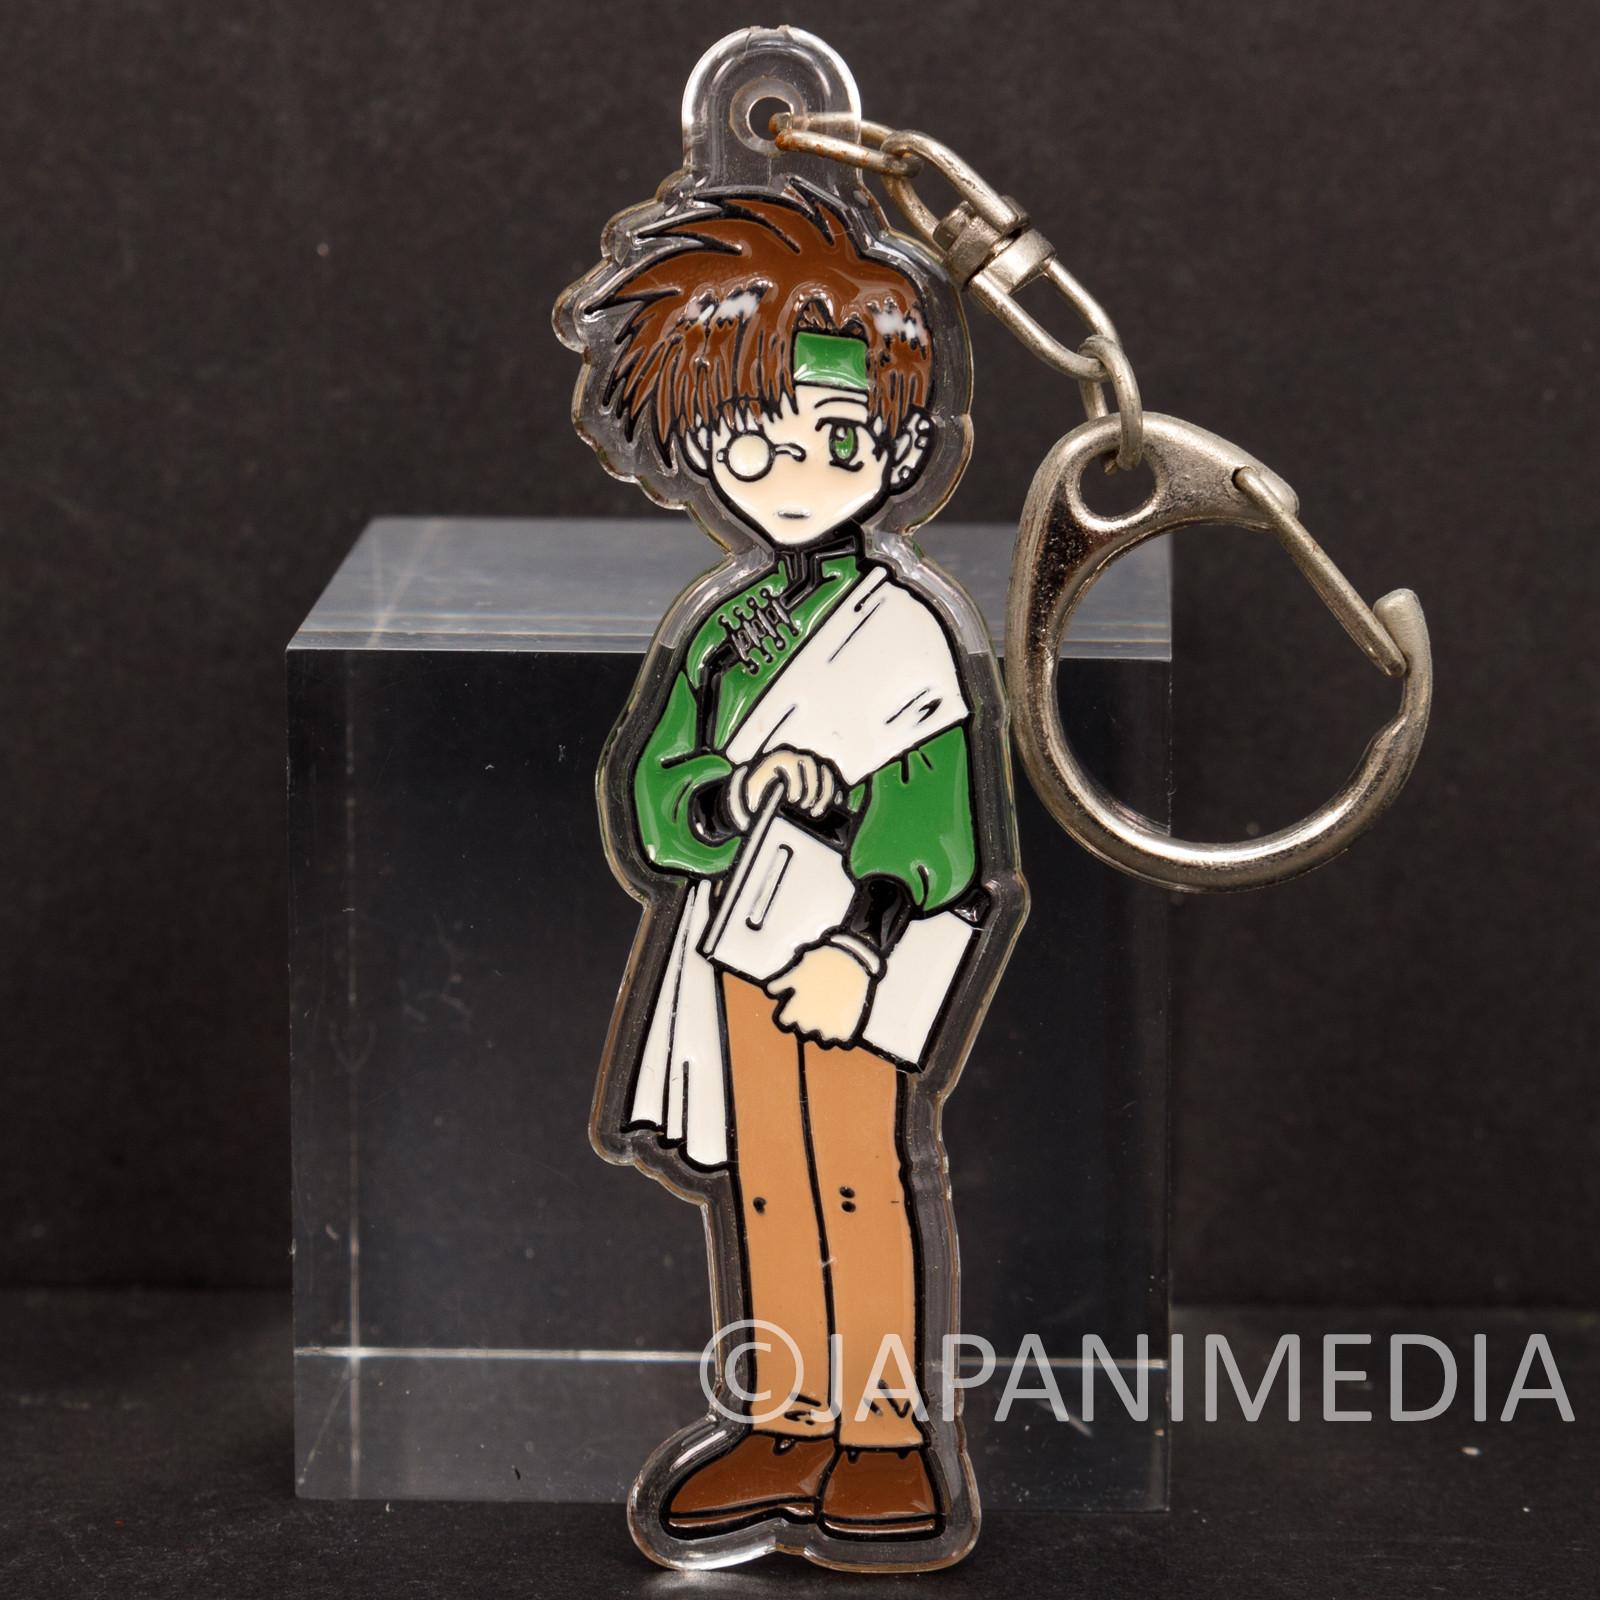 SAIYUKI Cho Hakkai Acrylic Mascot Keychain Movic Kazuya Minekura JAPAN